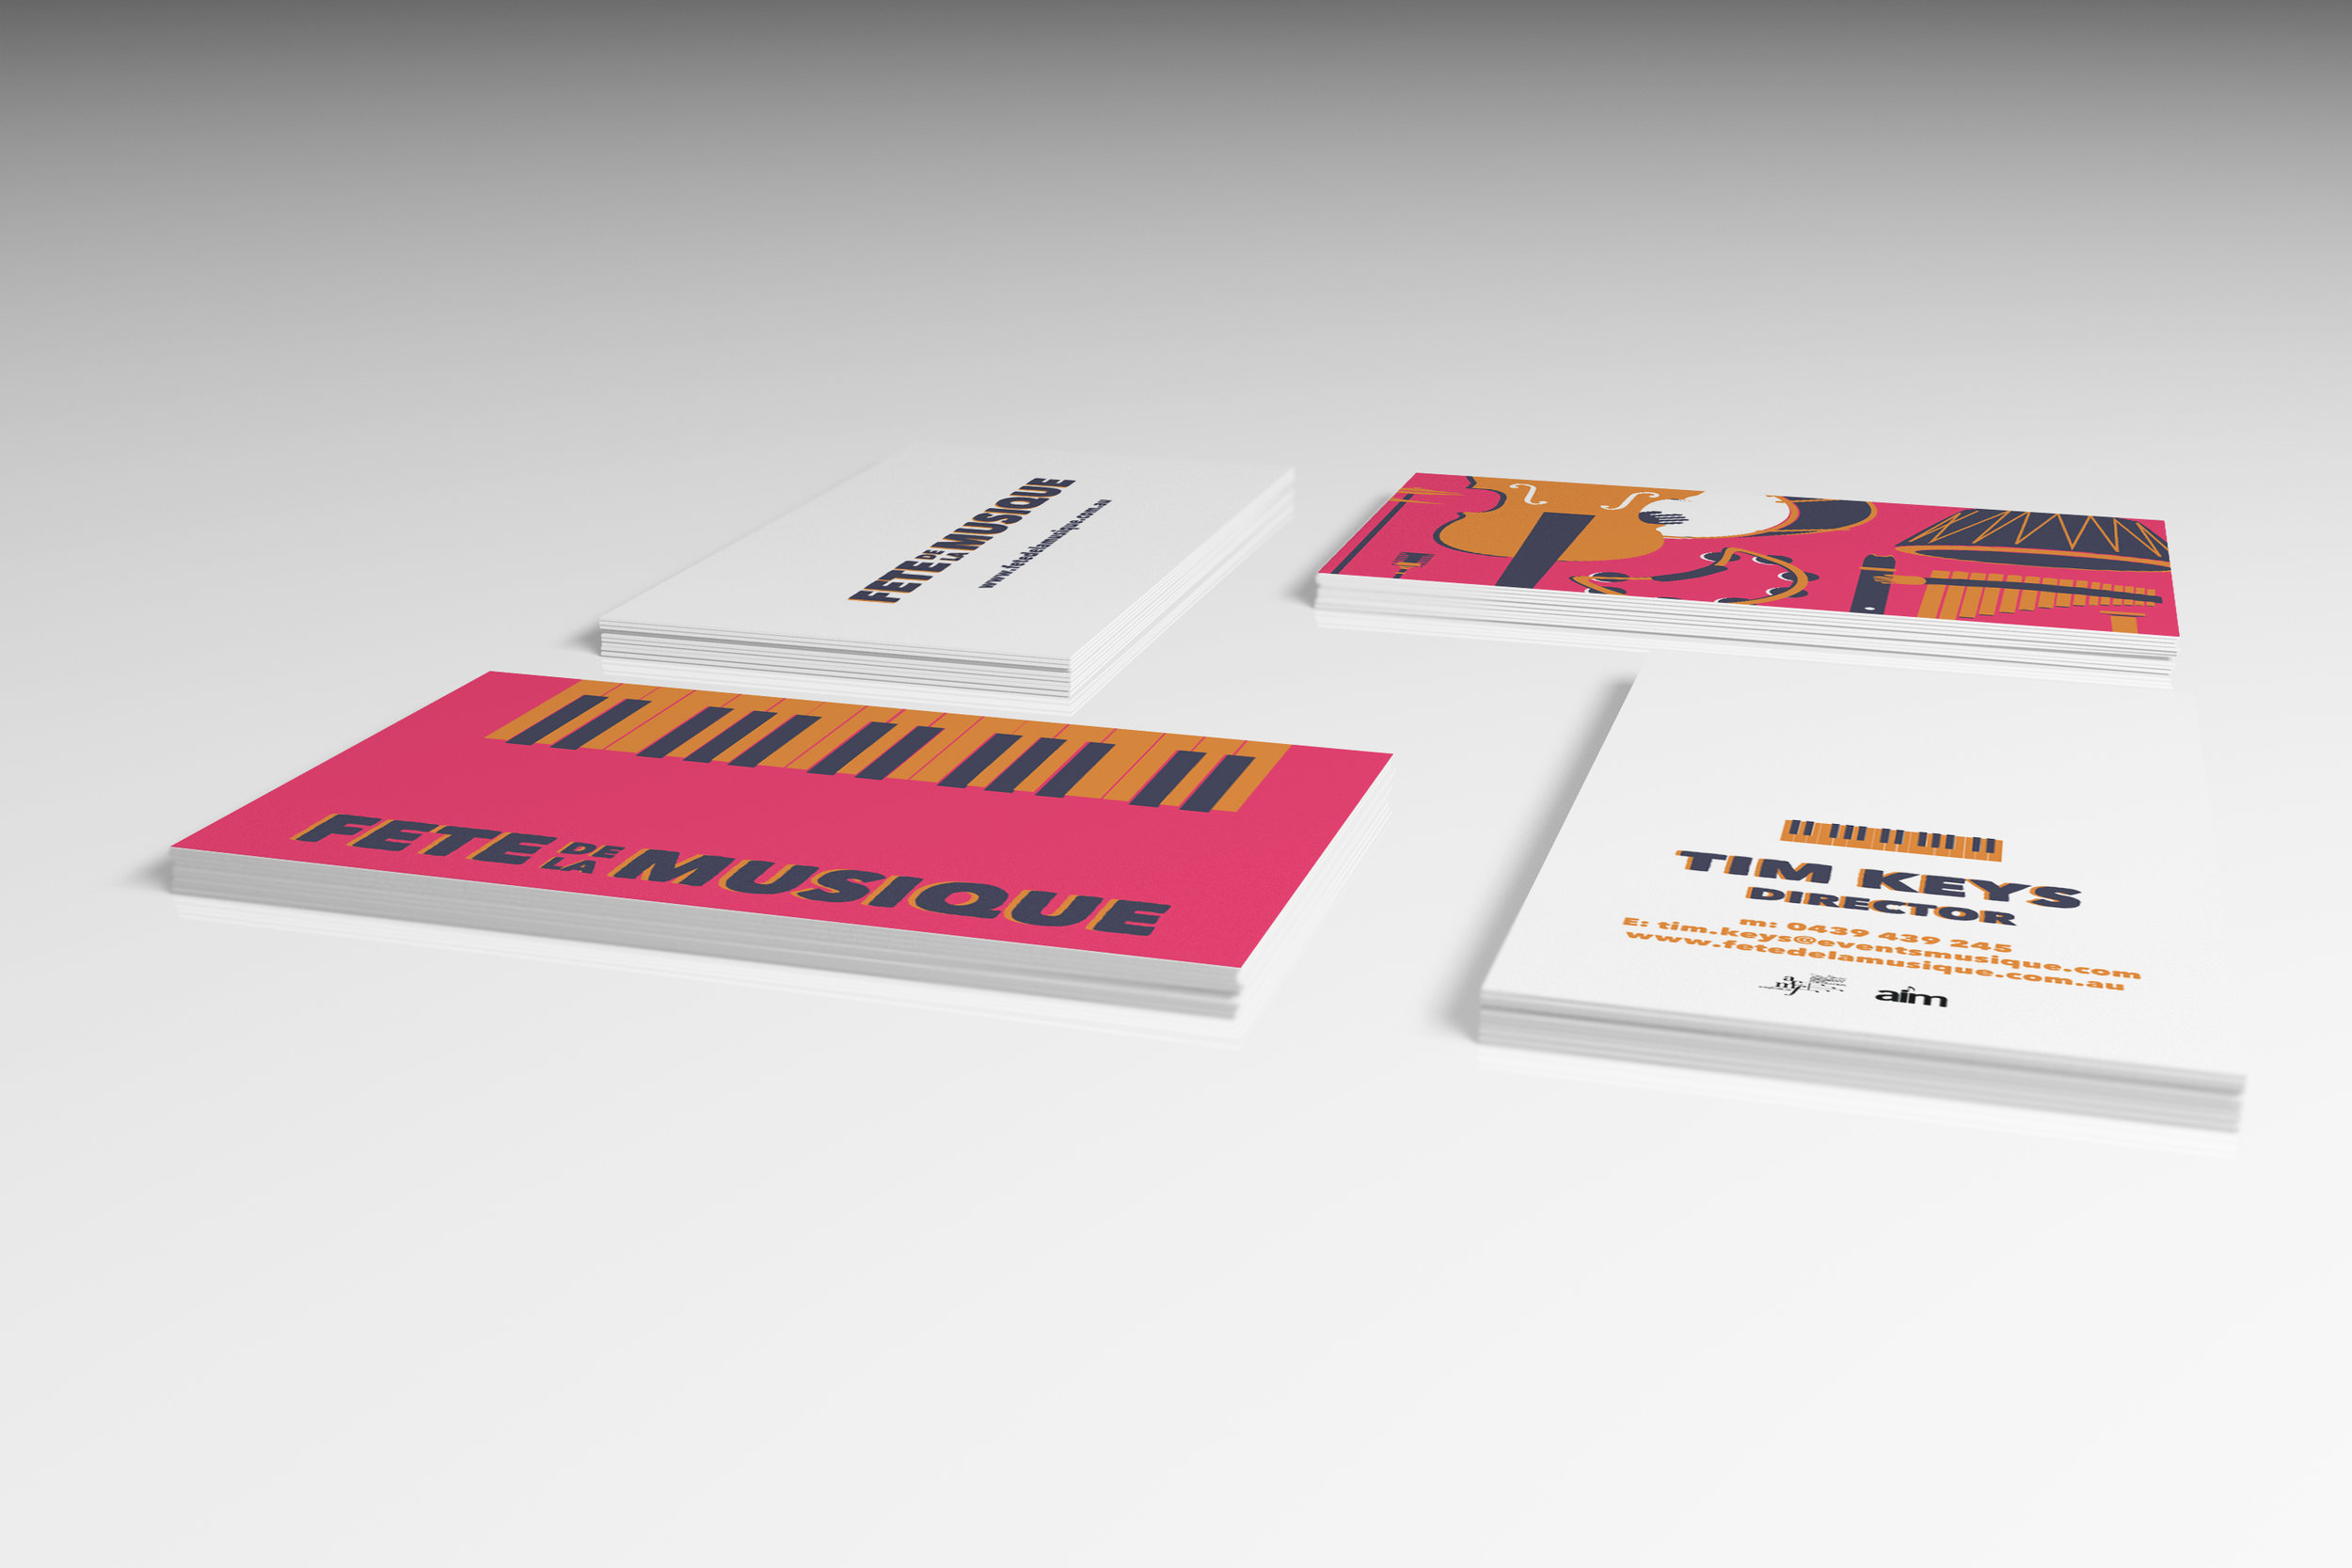 business card mock ups.jpg